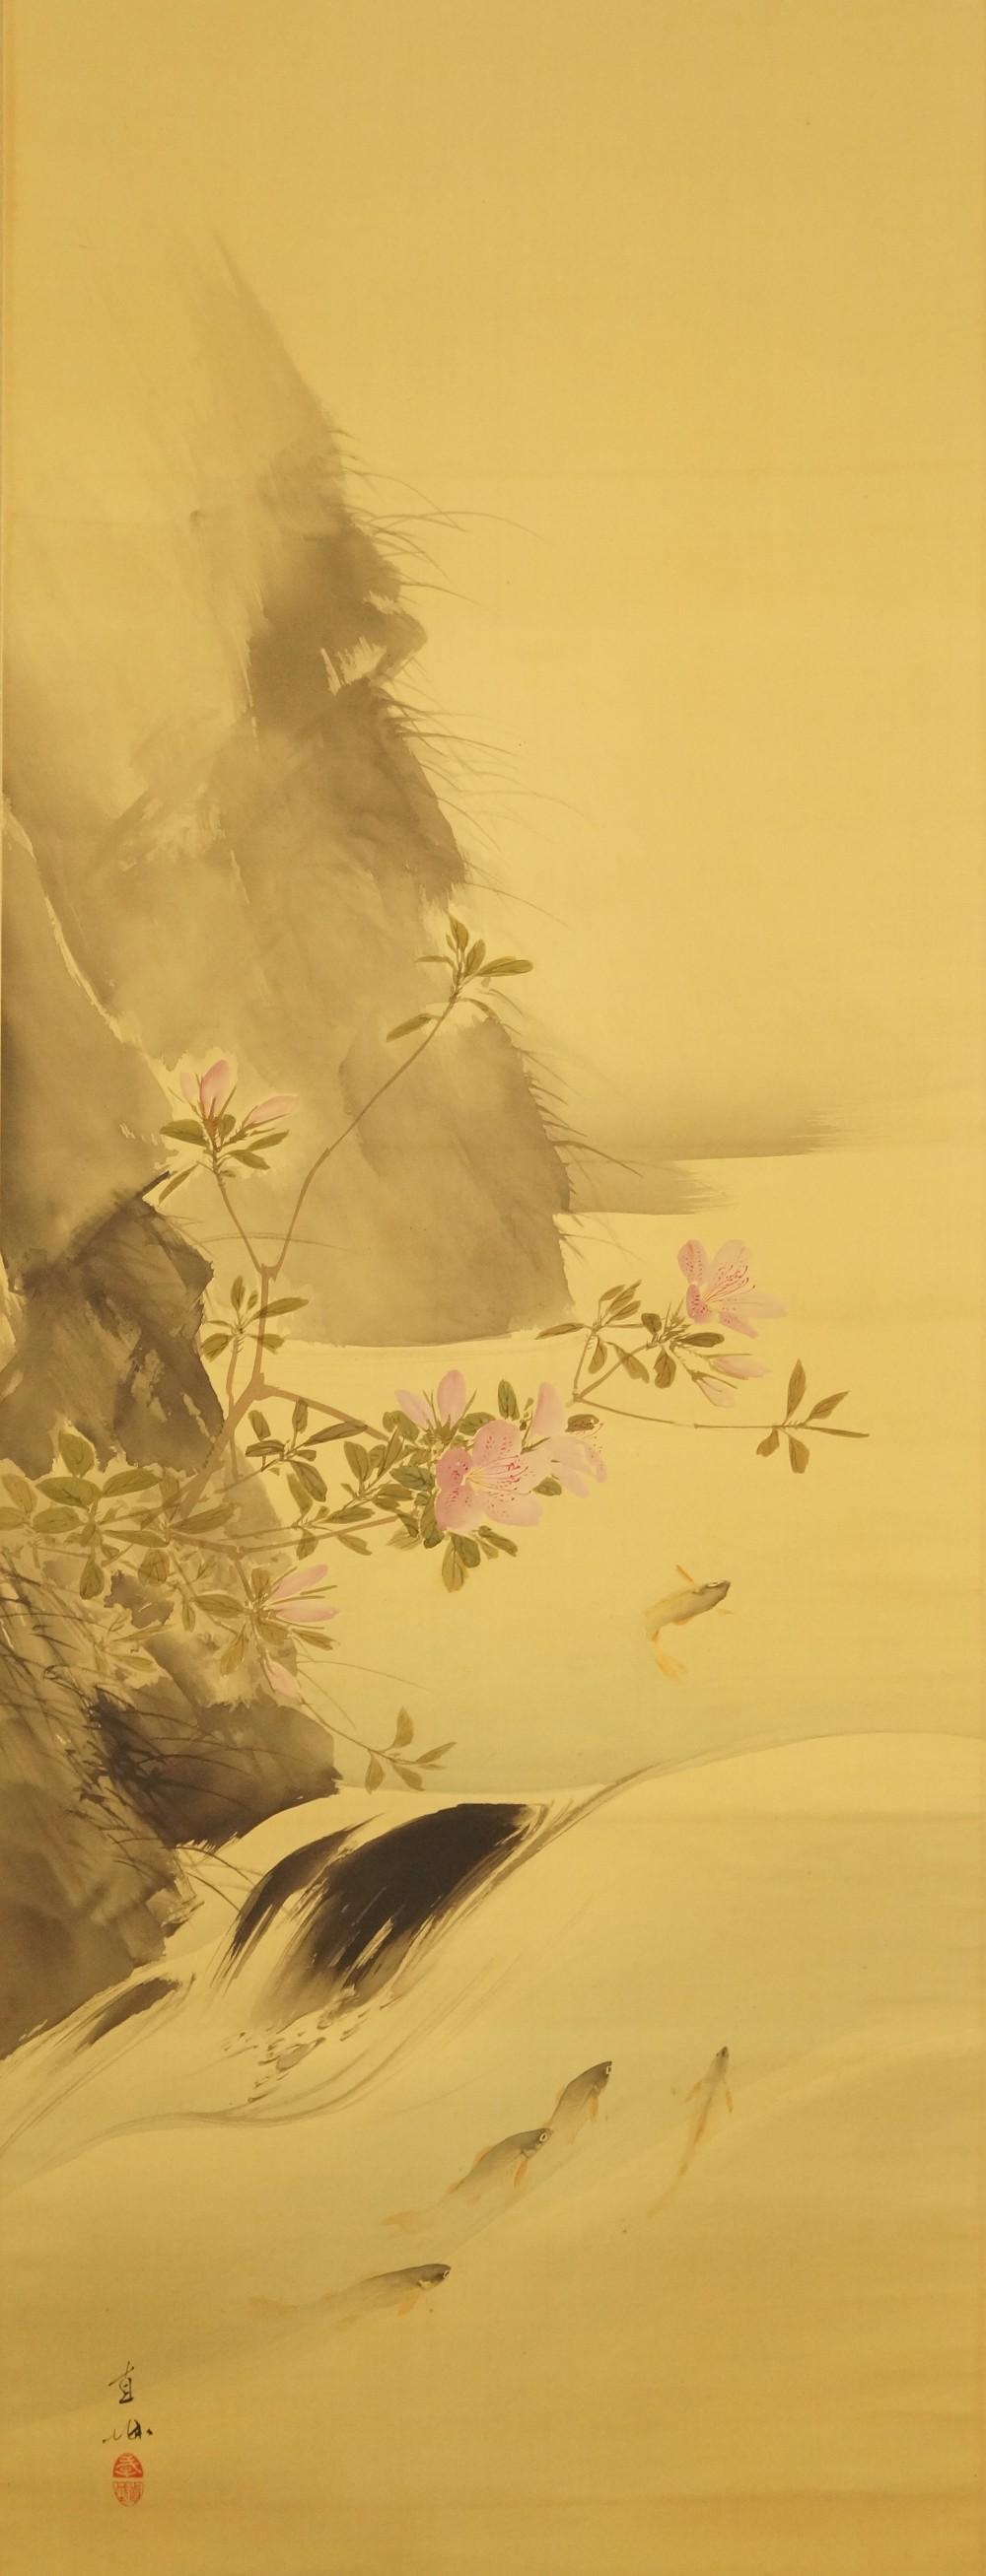 Forellen im stömenden Fluss - japanisches Rollgemälde (Kakejiku, Kakemono) von Fukada Chokushiro